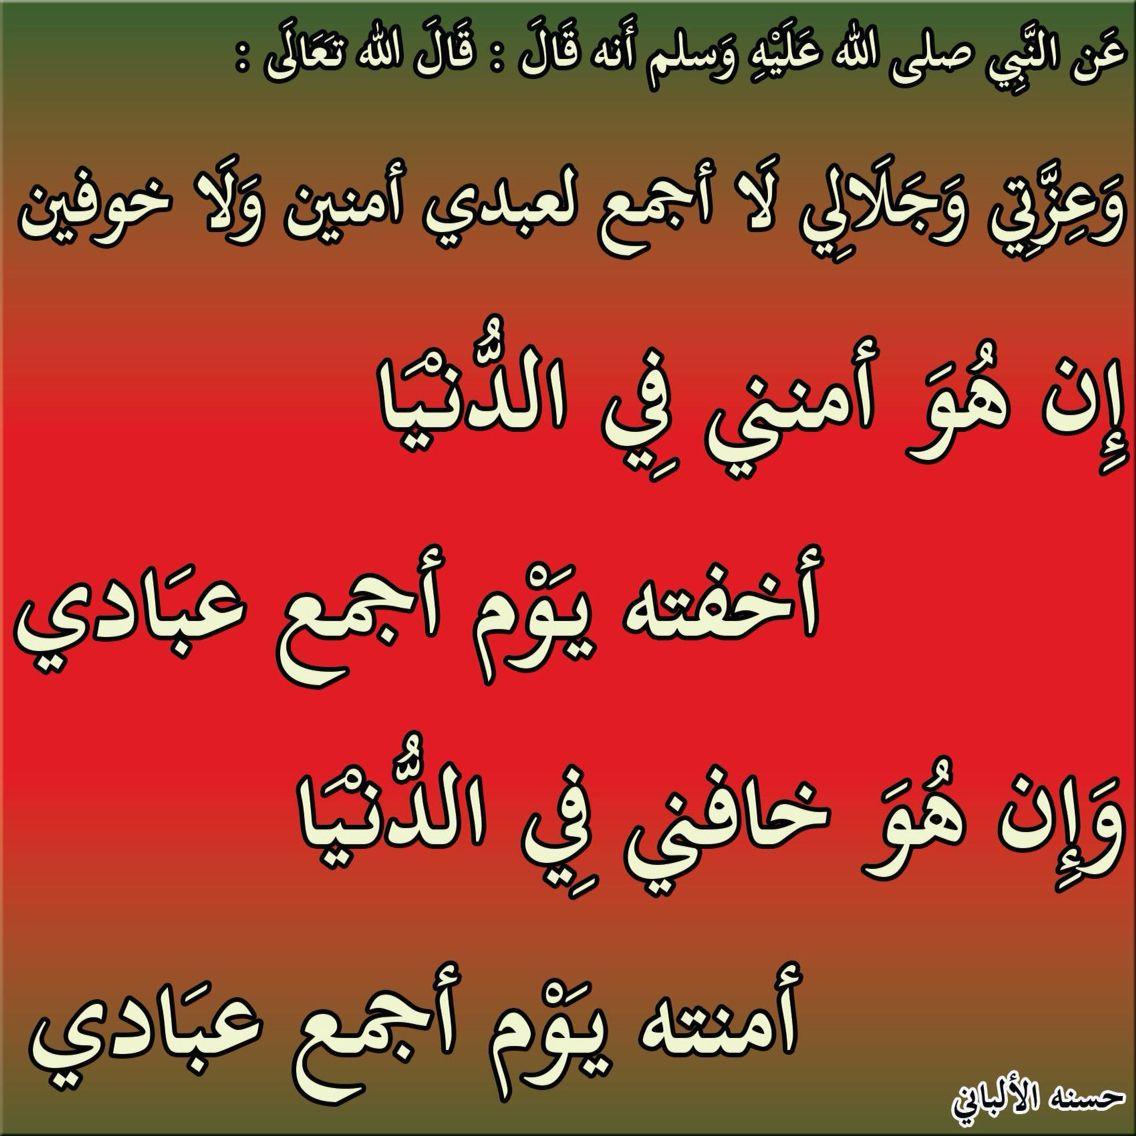 احاديث قدسيه Arabic Arabic Calligraphy Calligraphy